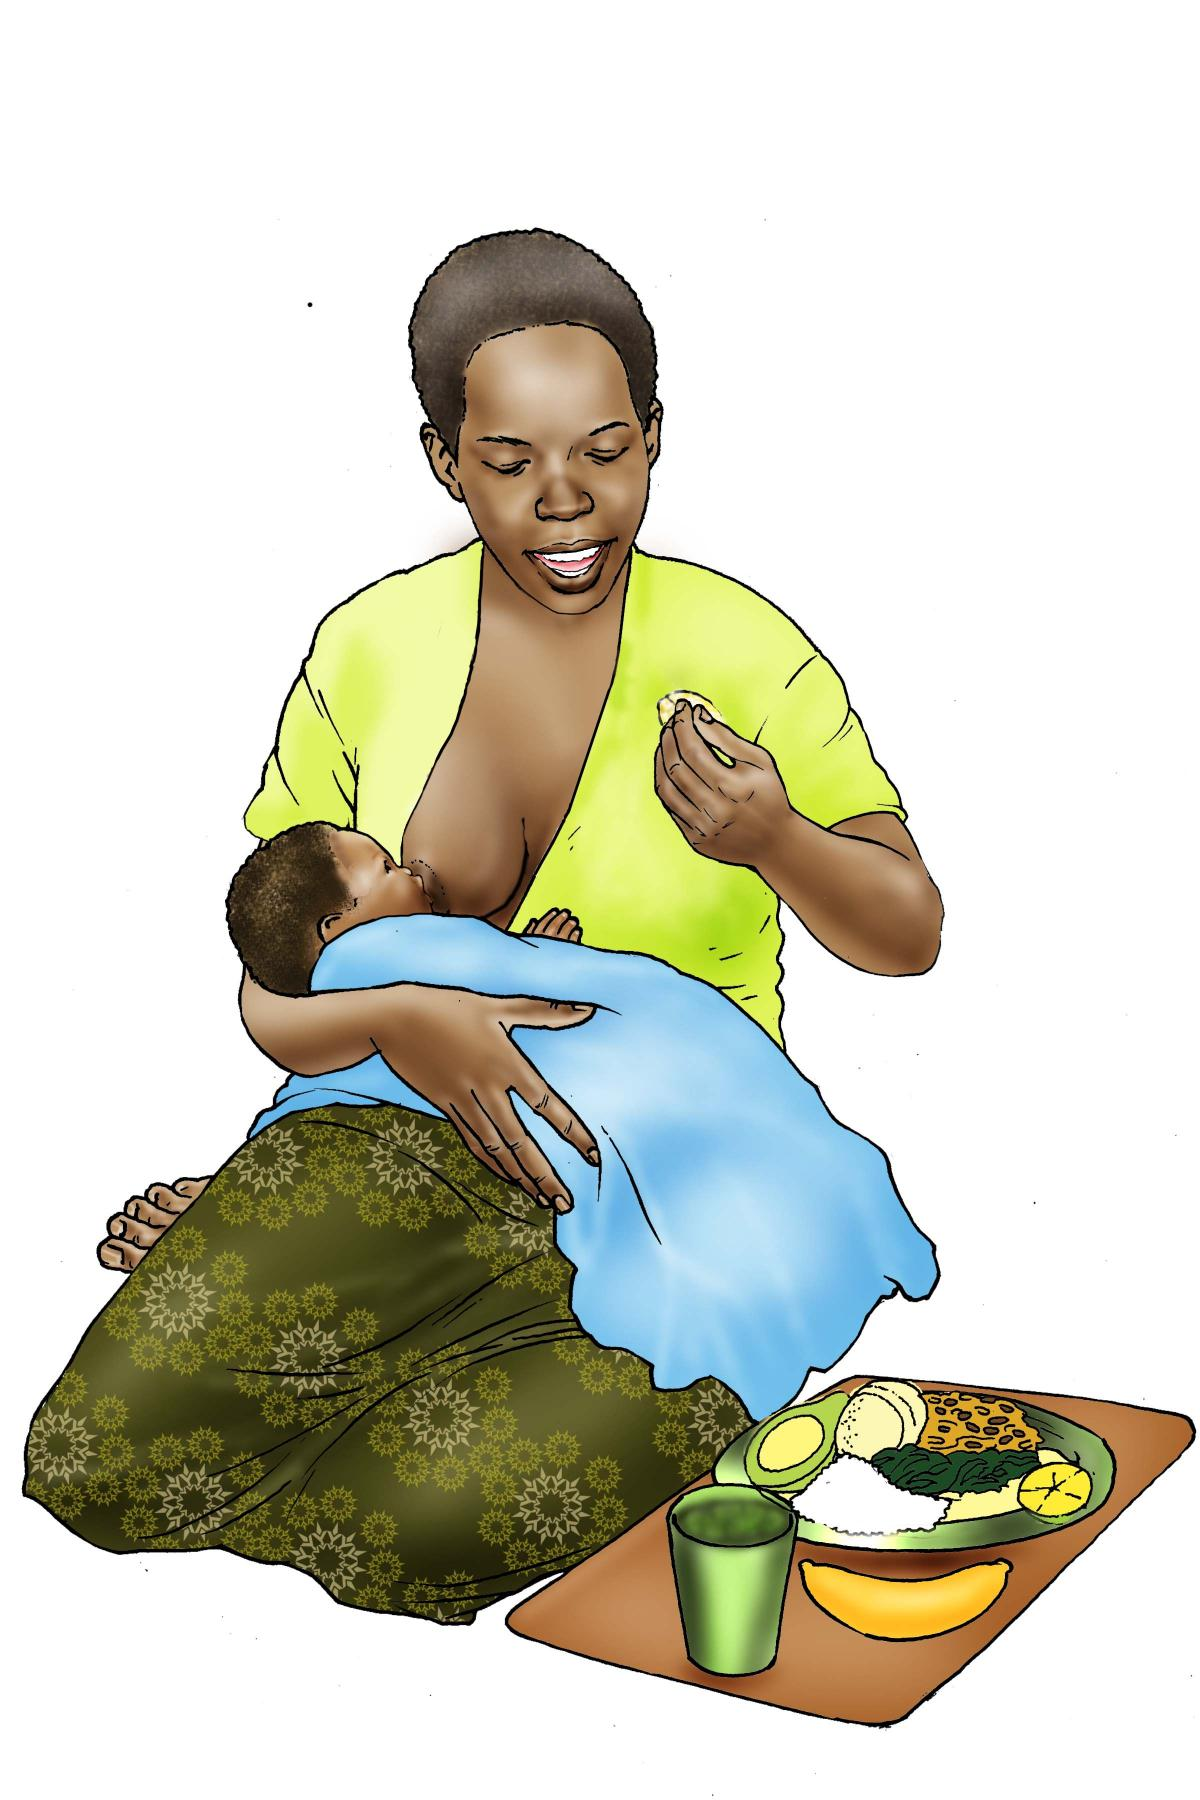 Maternal nutrition - Breastfeeding mother eating - 03 - Nigeria